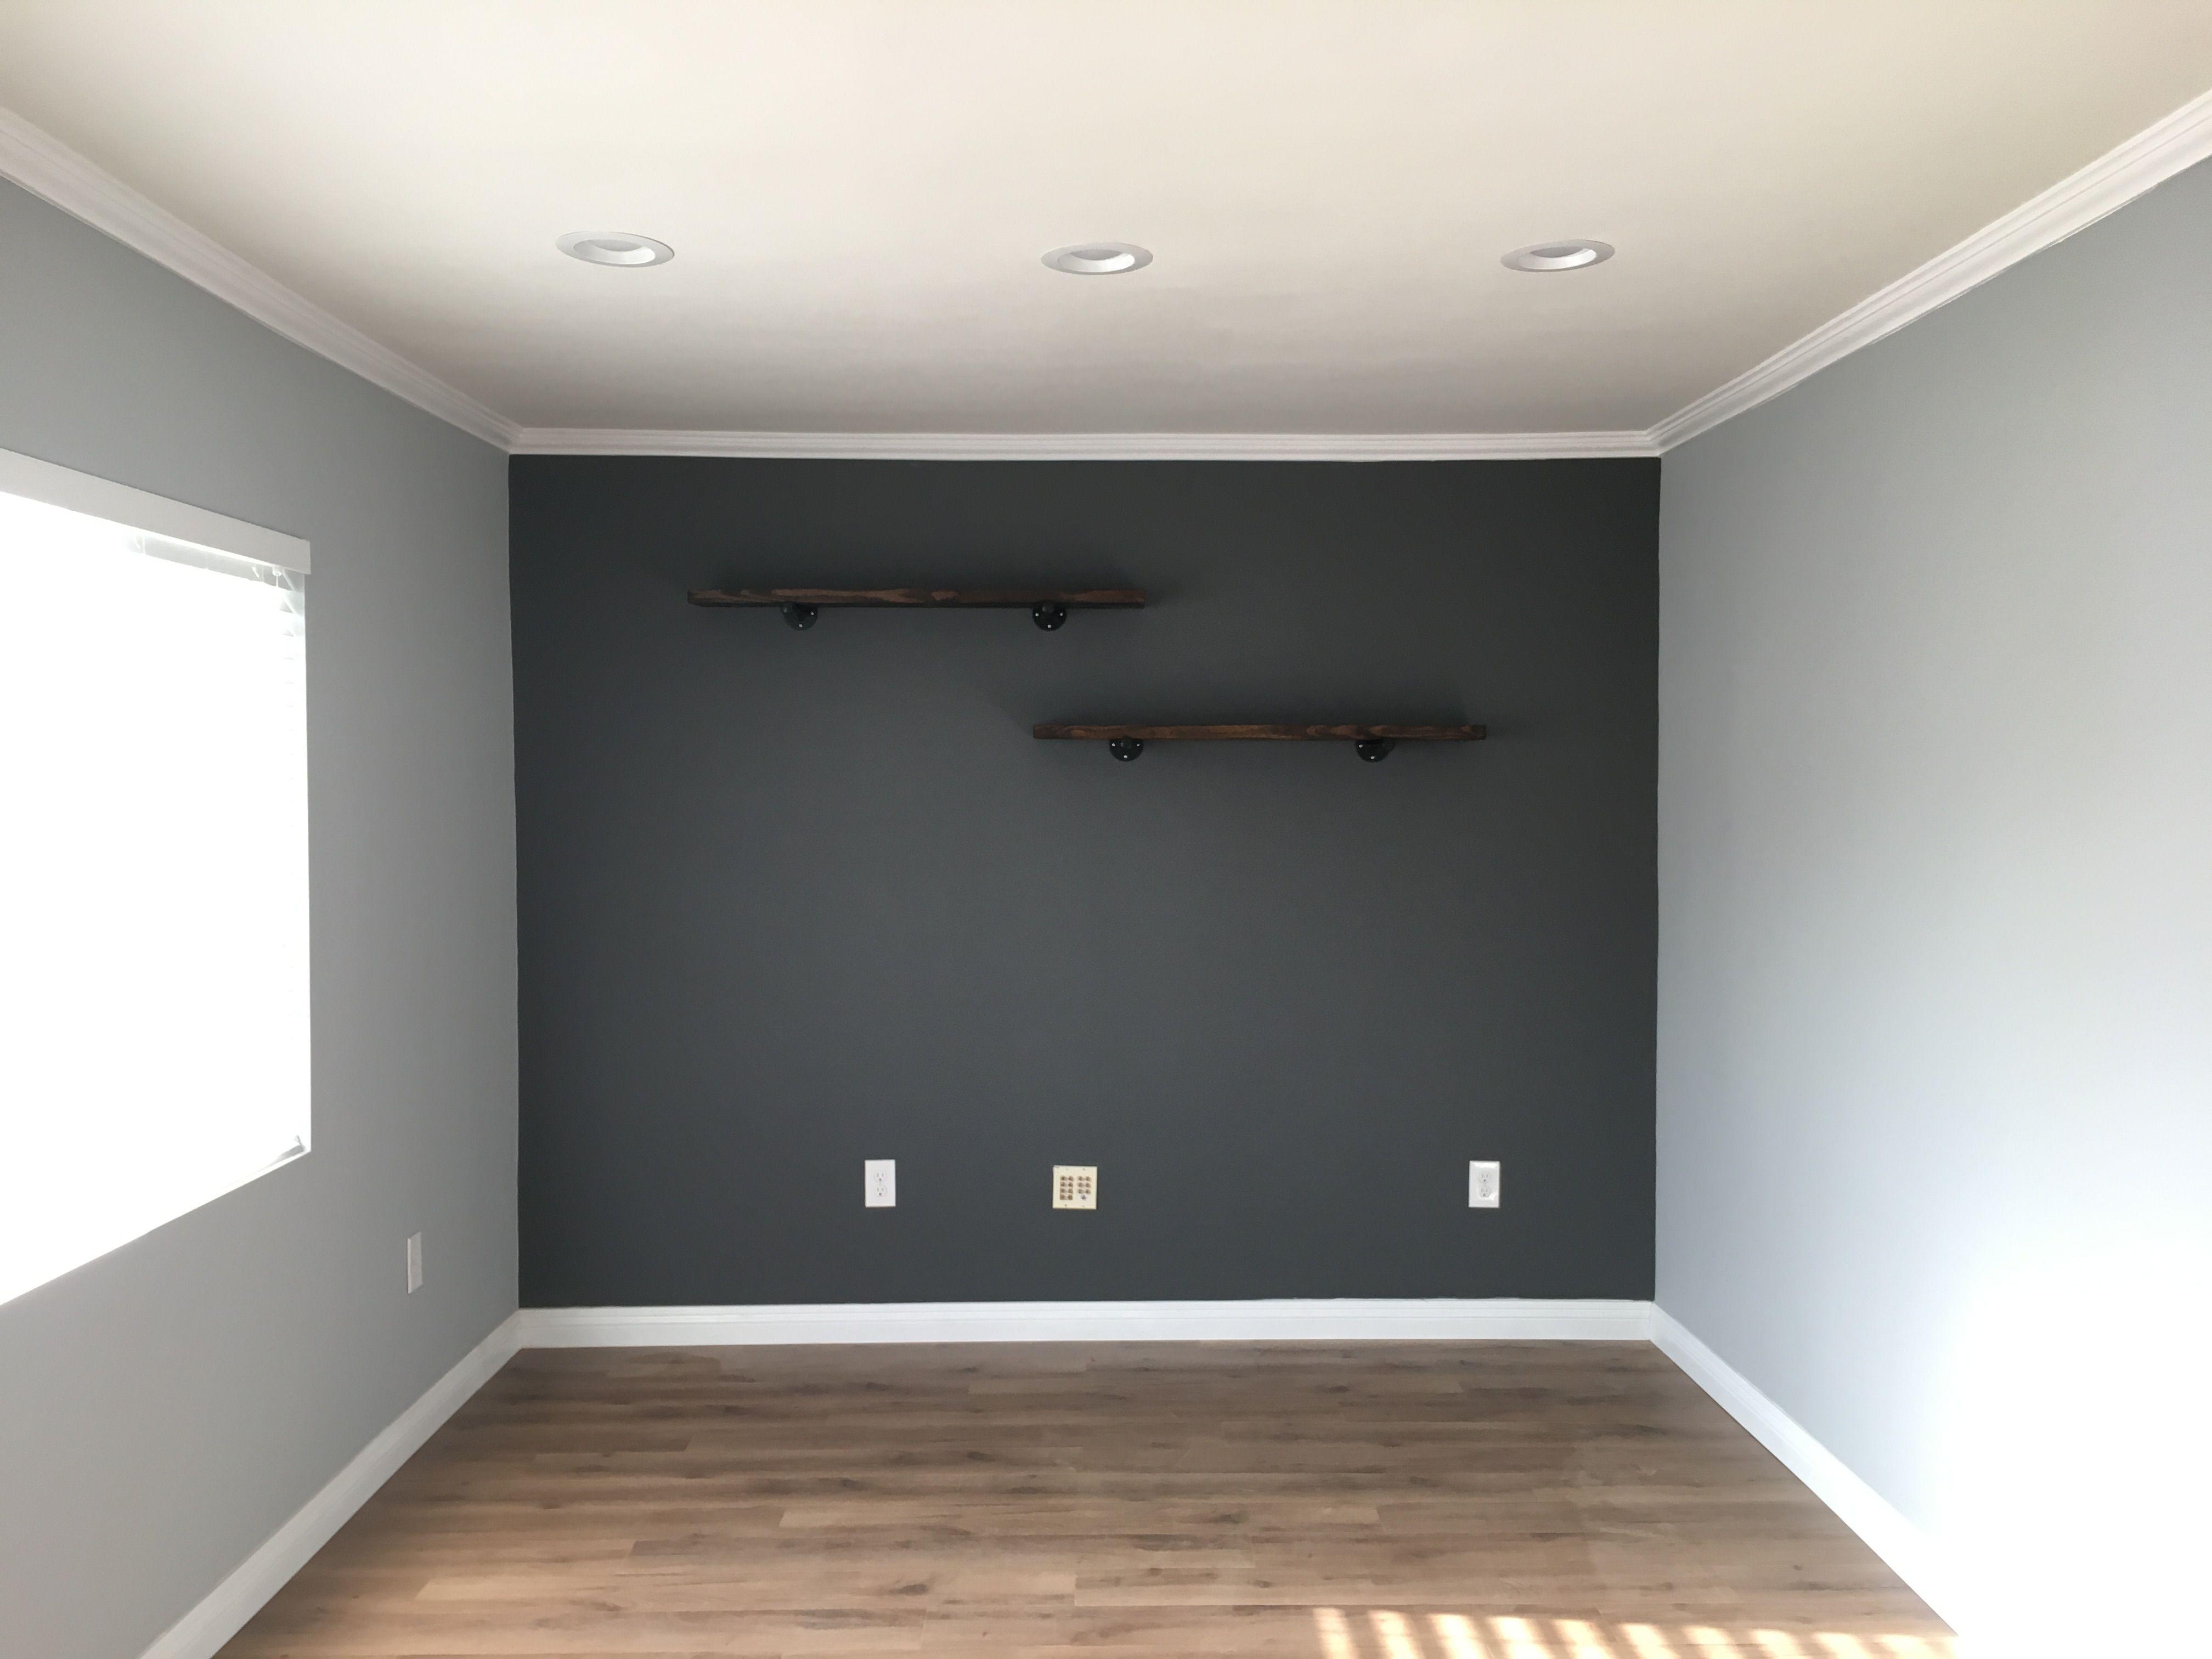 Pin By Kara On Bedroom Ideas In 2020 Dark Grey Walls Grey Accent Wall Light Grey Walls